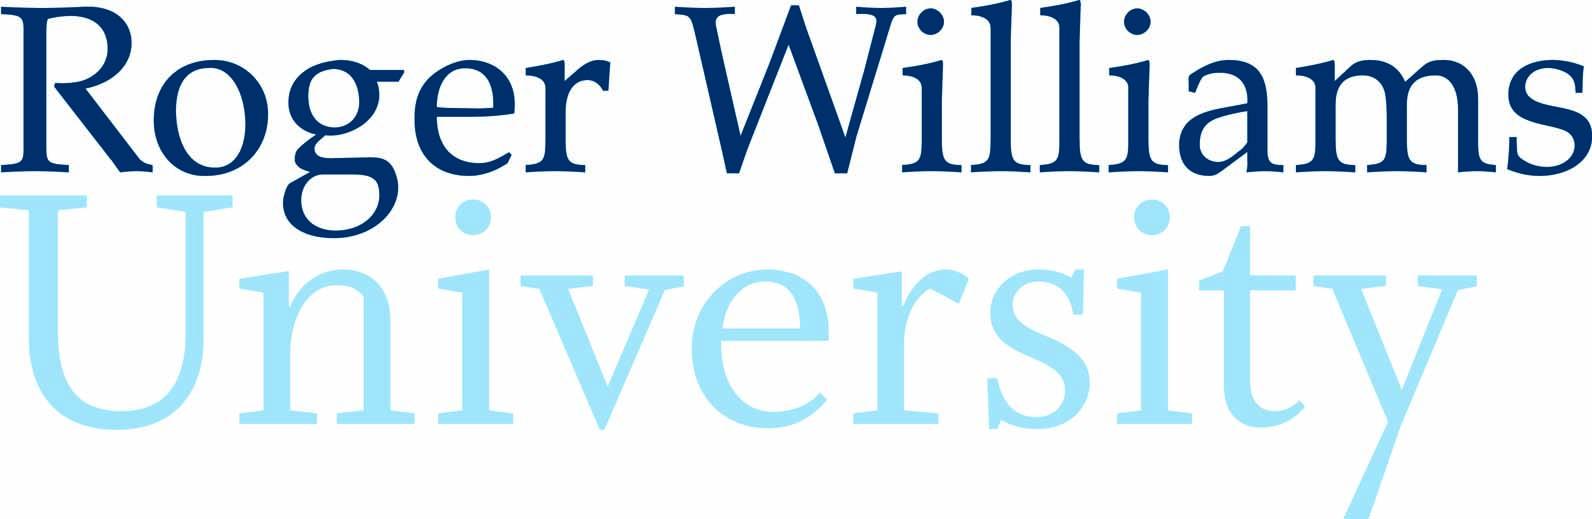 Roger Williams University: SECCM